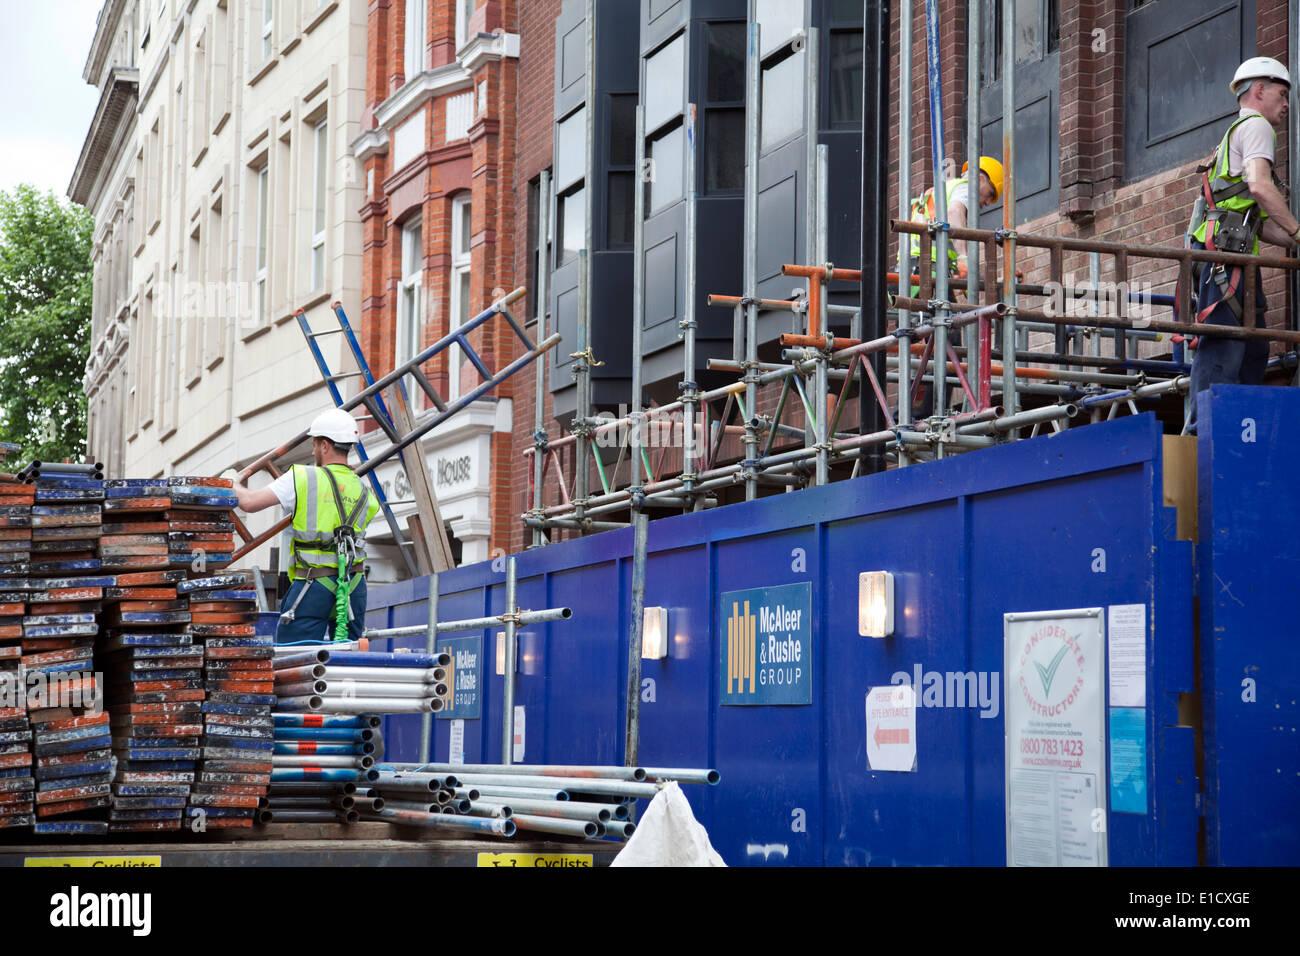 Scaffolders in Central London - St Martins Lane - UK - Stock Image